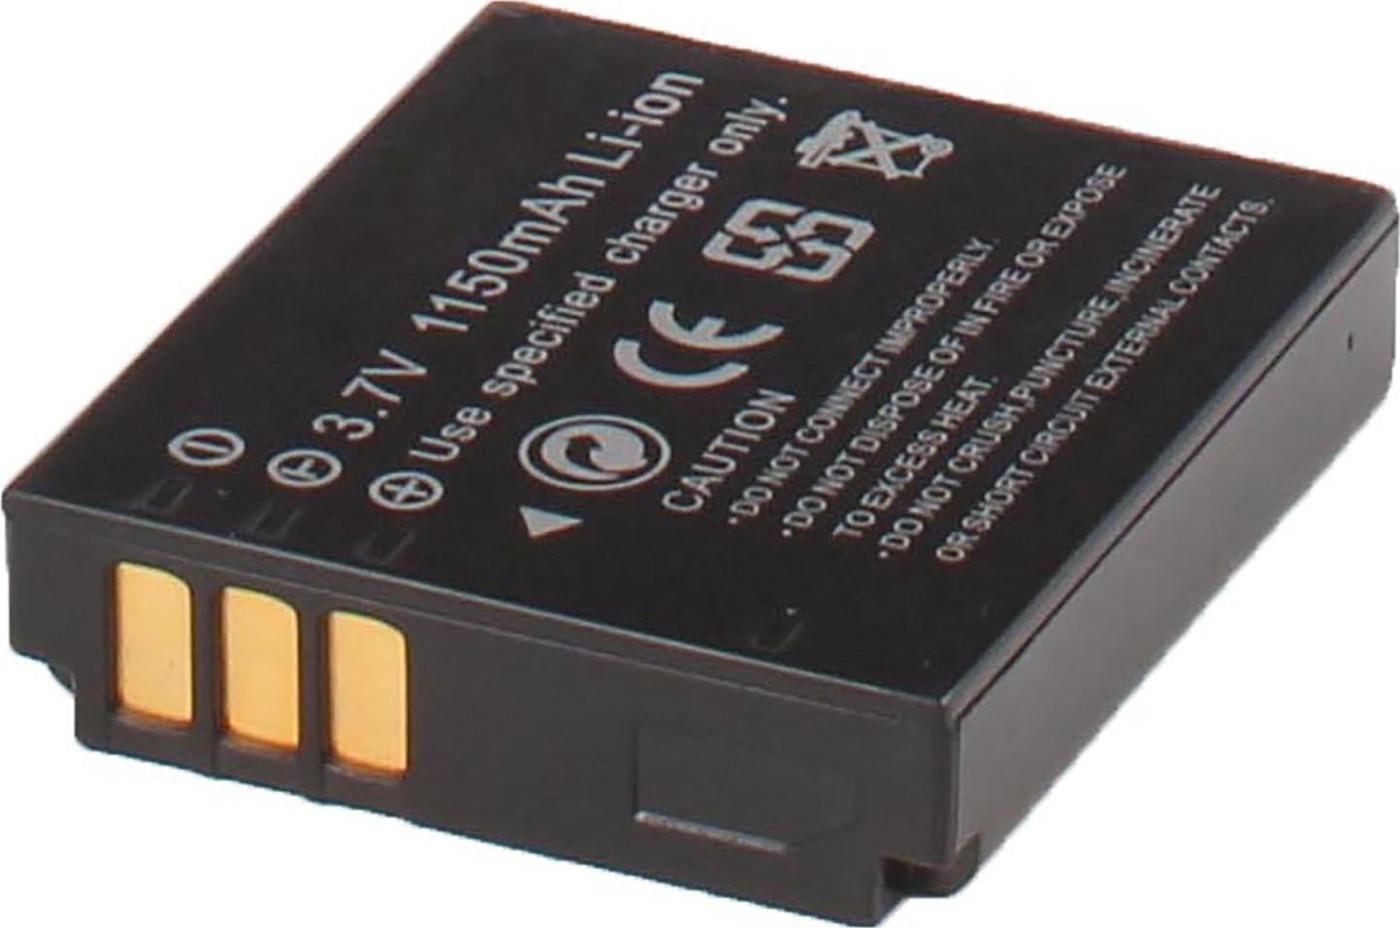 Аккумуляторная батарея iBatt iB-T1-F148 1150mAh для камер FujiFilm FinePix F40FD, FinePix F20, FinePix F47FD,  для Leica D-Lux 4, D-Lux 3,  для Panasonic Lumix DMC-LX3, Lumix DMC-LX2, Lumix DMC-FX01-A, Lumix DMC-FX10, Lumix DMC-LX1, Lumix DMC-FX12,